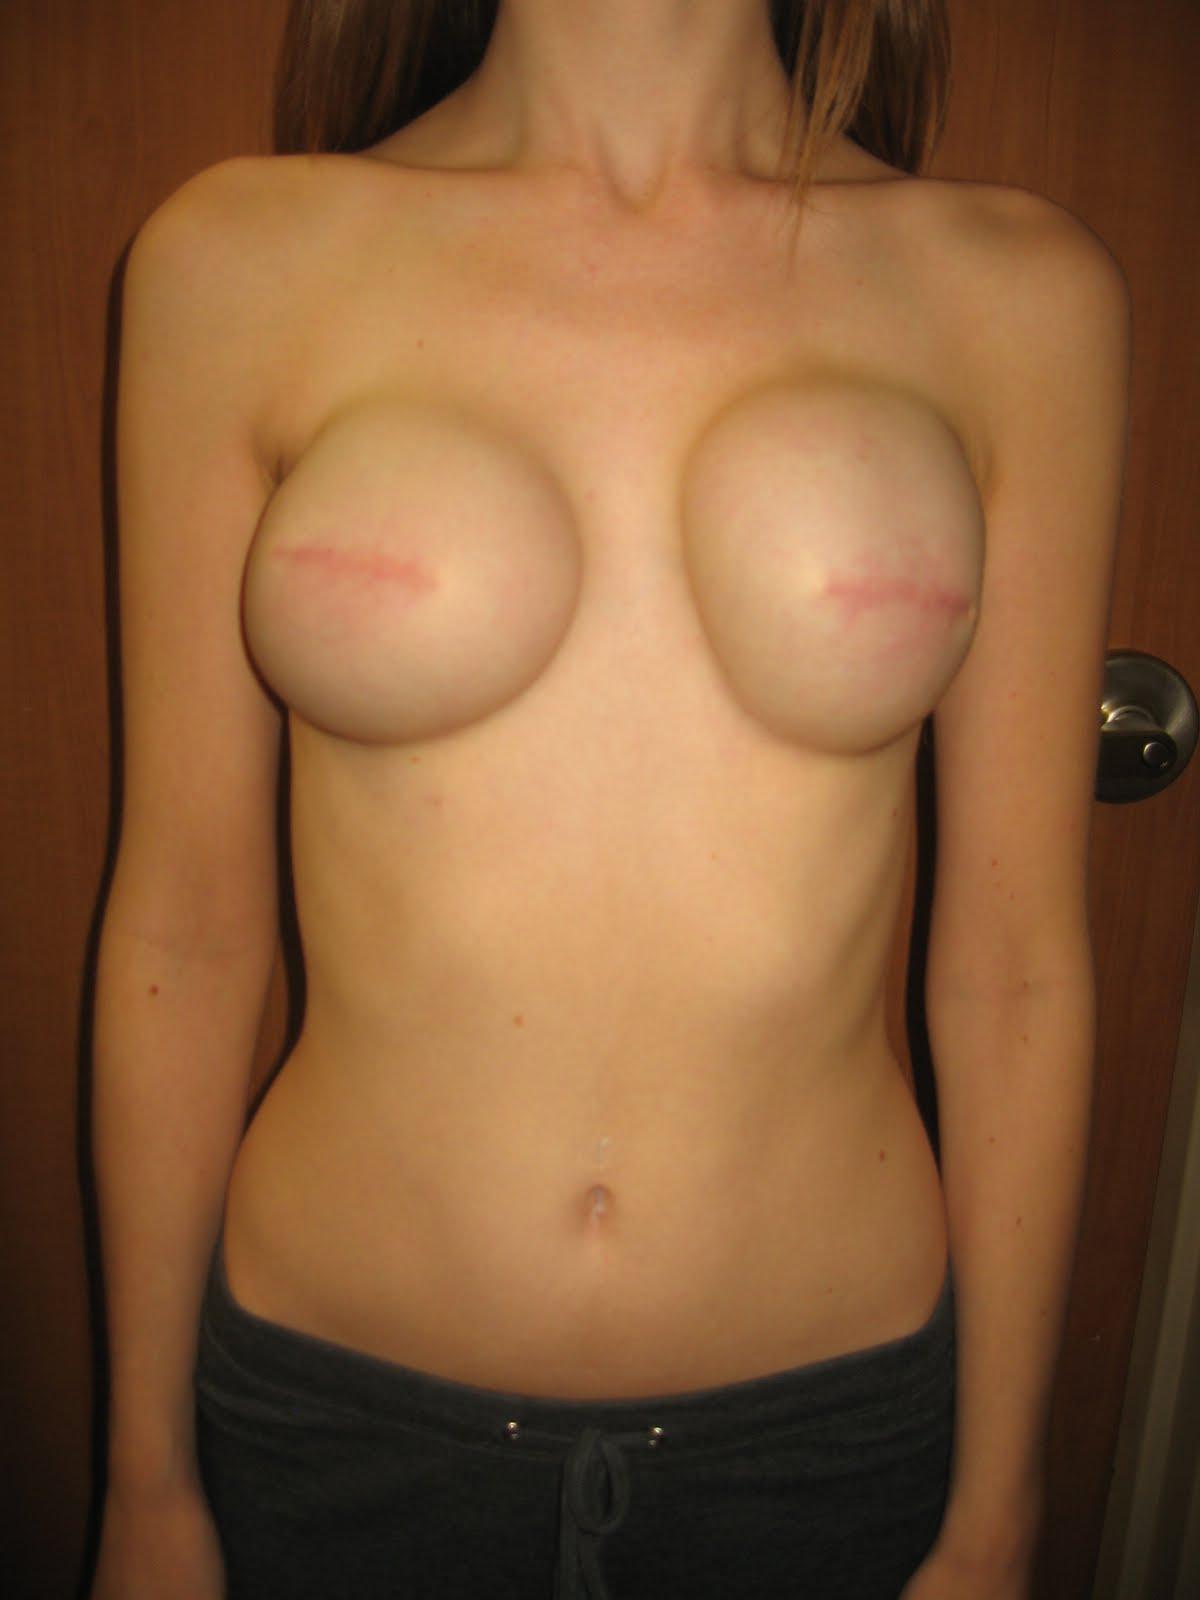 alicia witt nude pictures